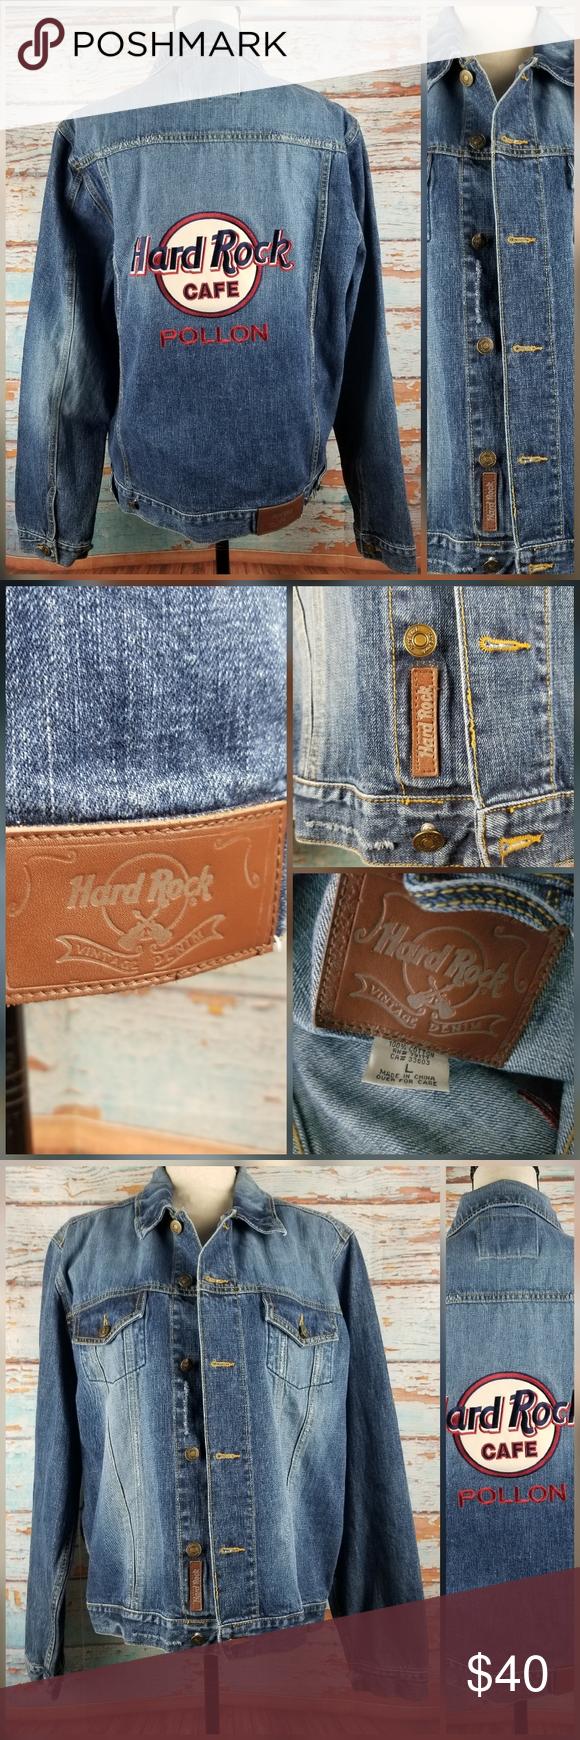 Hard Rock Cafe Logo Denim Jean Jacket Sz L Hard Rock Cafe Denim Jean Jacket Sz L 100 Cotton 23 Underarm To Underarm 25 Denim Jean Jacket Cafe Jacket Jackets [ 1740 x 580 Pixel ]